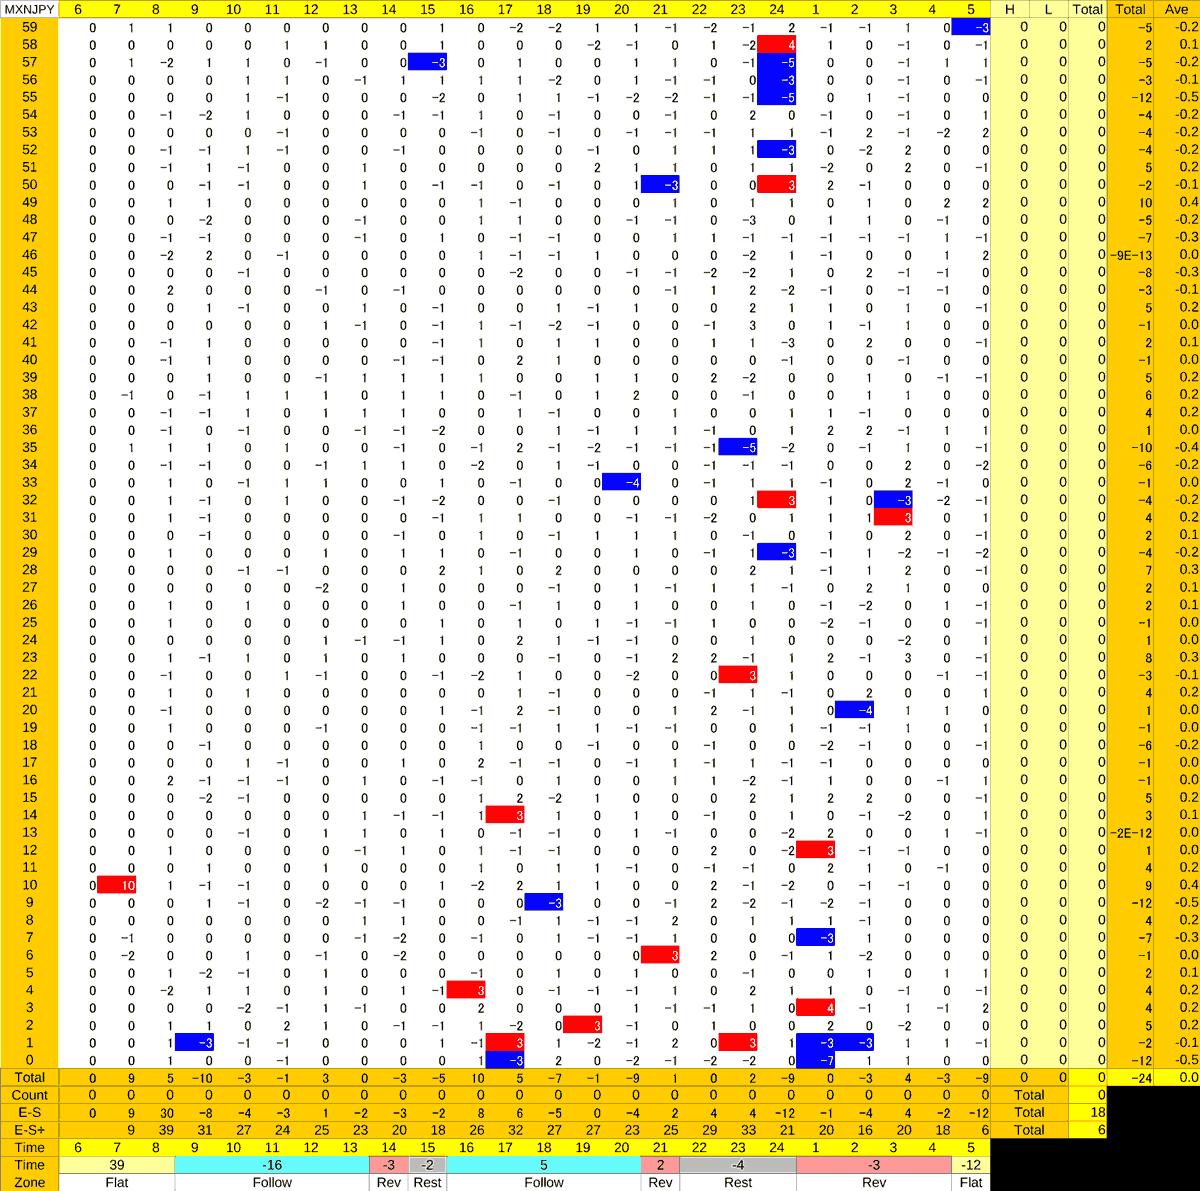 20201130_HS(3)MXNJPY